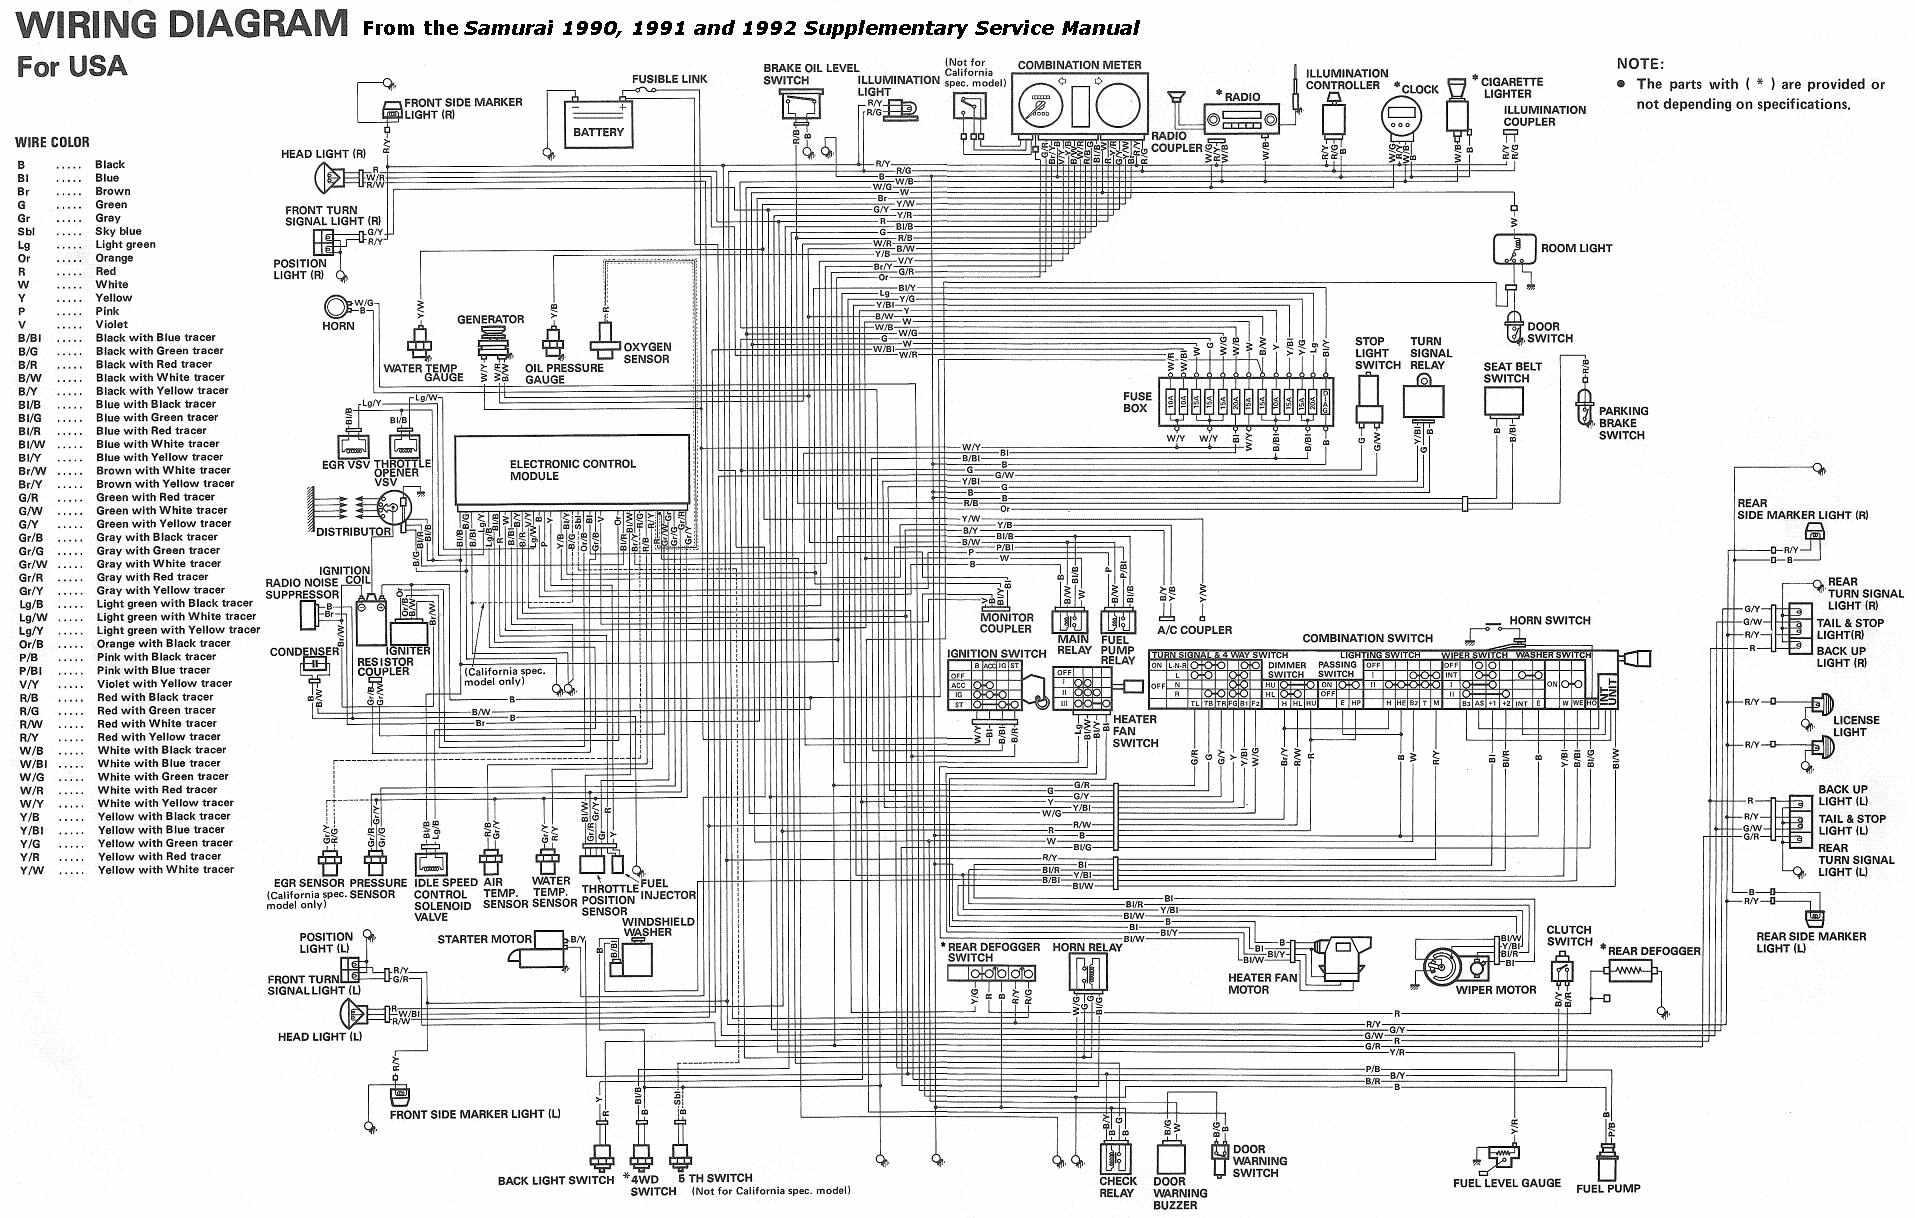 87 toyota pickup wiring diagram facbooik com 1990 Toyota Pickup Wiring Diagram 87 toyota pickup wiring diagram facbooik 1990 toyota pickup wiring diagram